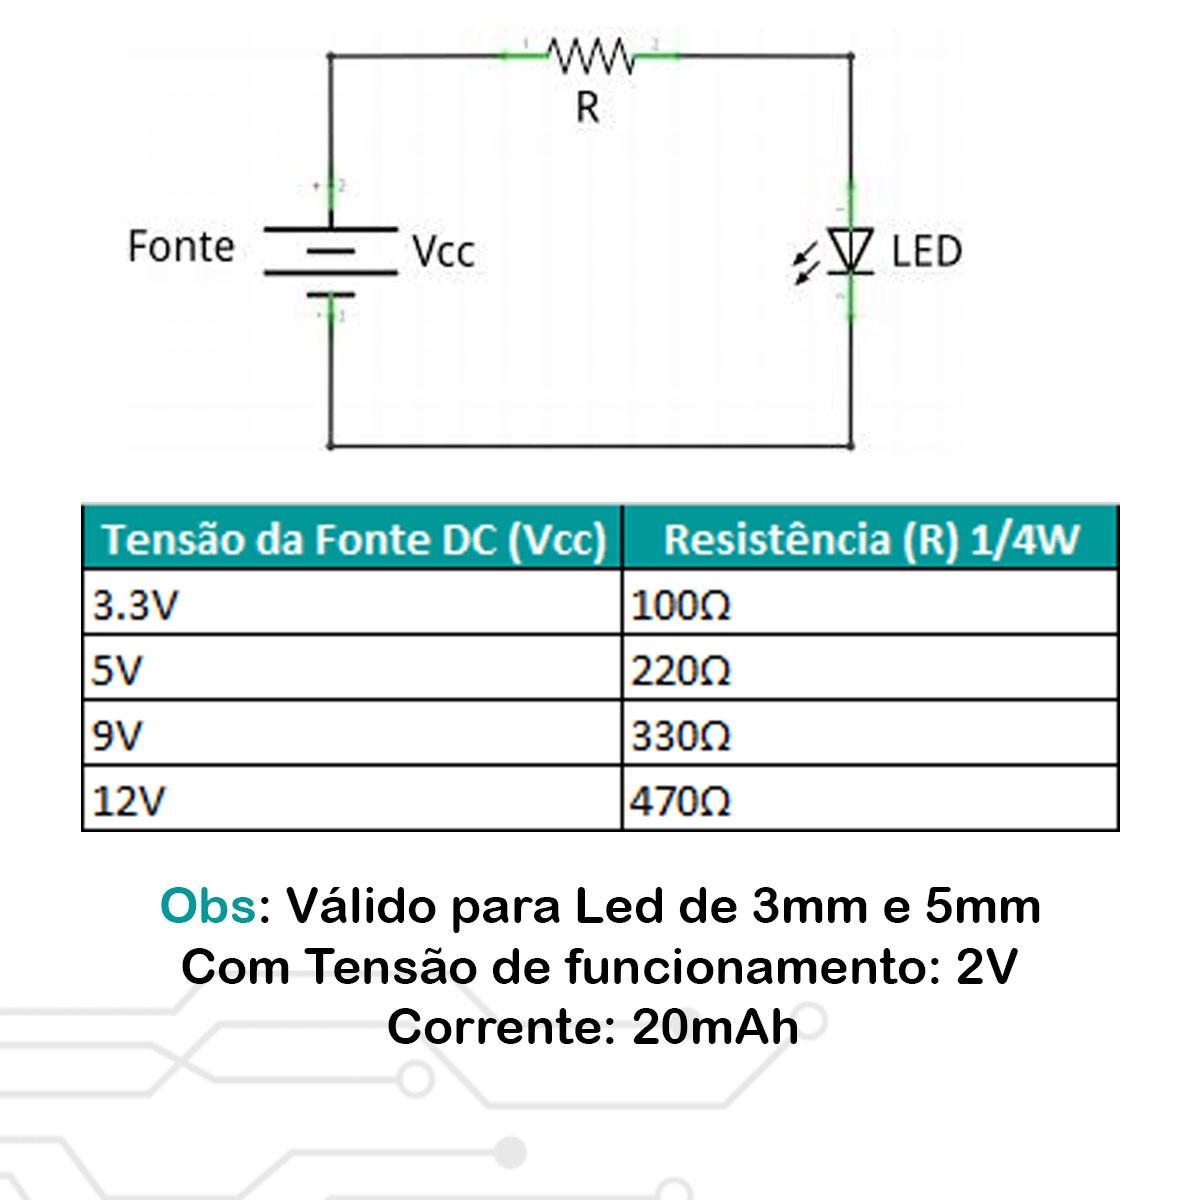 Kit Diversas Cores com 100 Leds de 5mm Difuso 20 de cada Cor